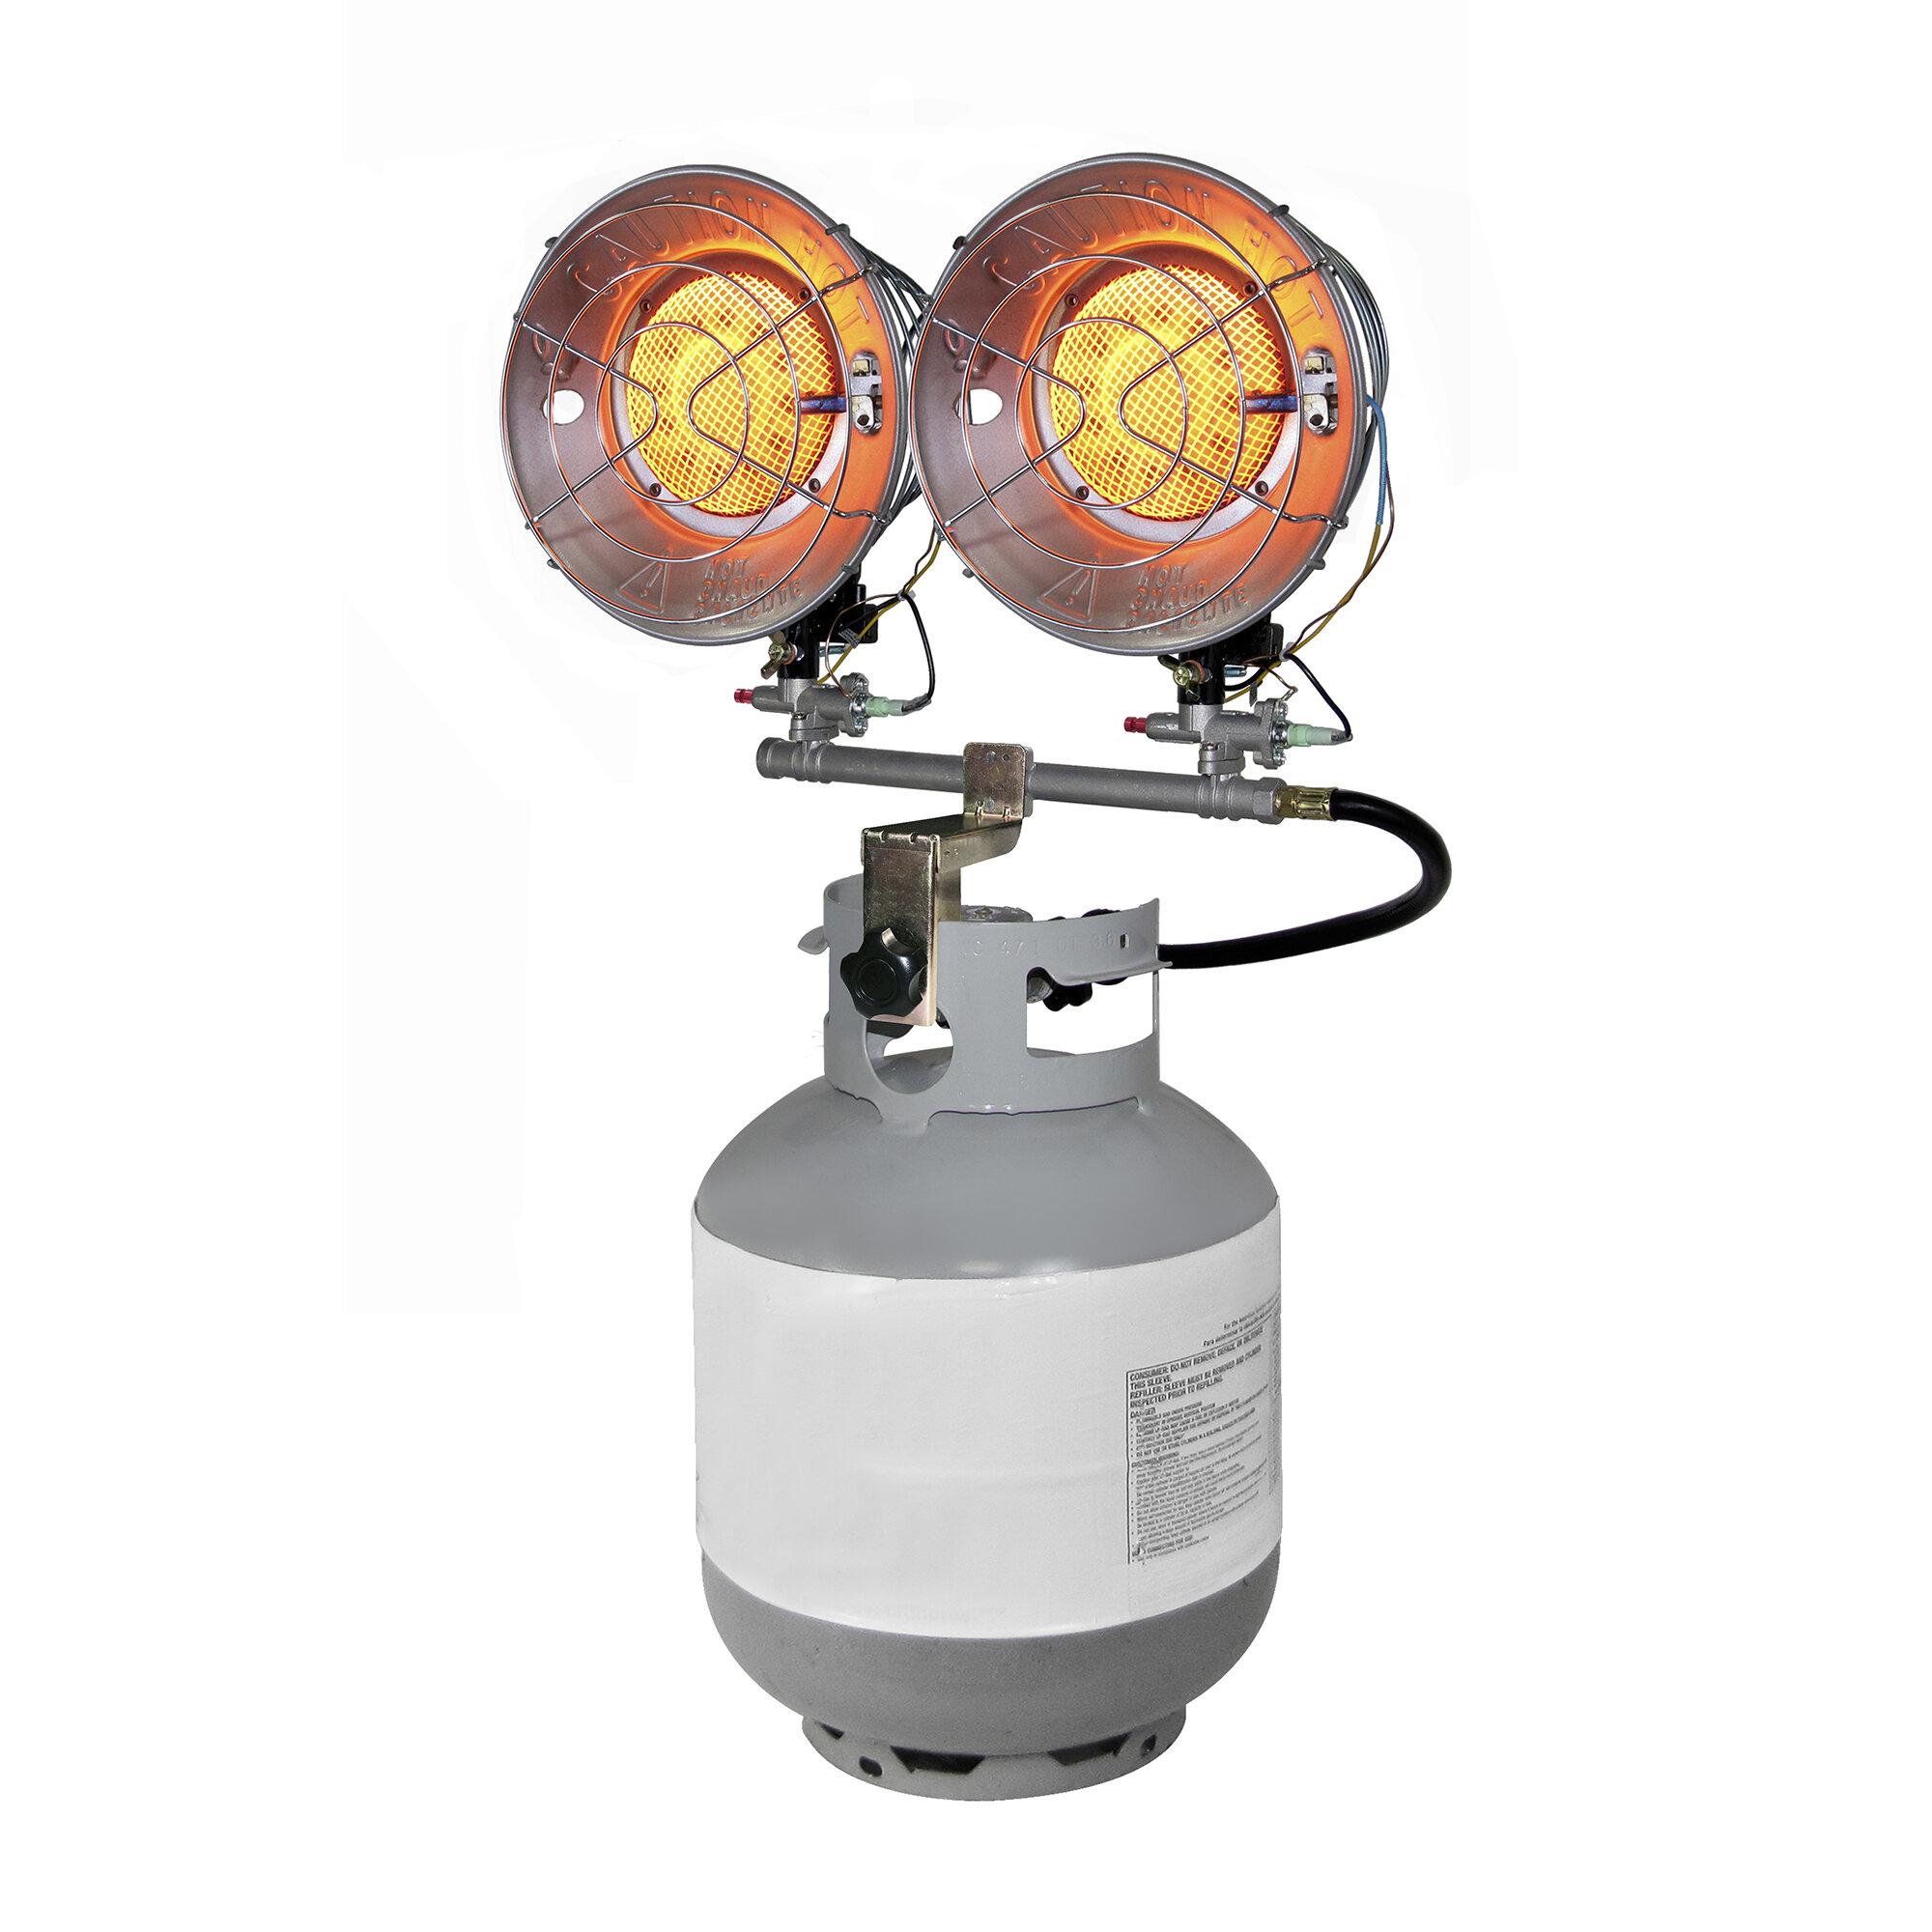 Propane Radiant Heater >> Dyna Glo 15 000 Btu Portable Propane Radiant Tank Top Heater With